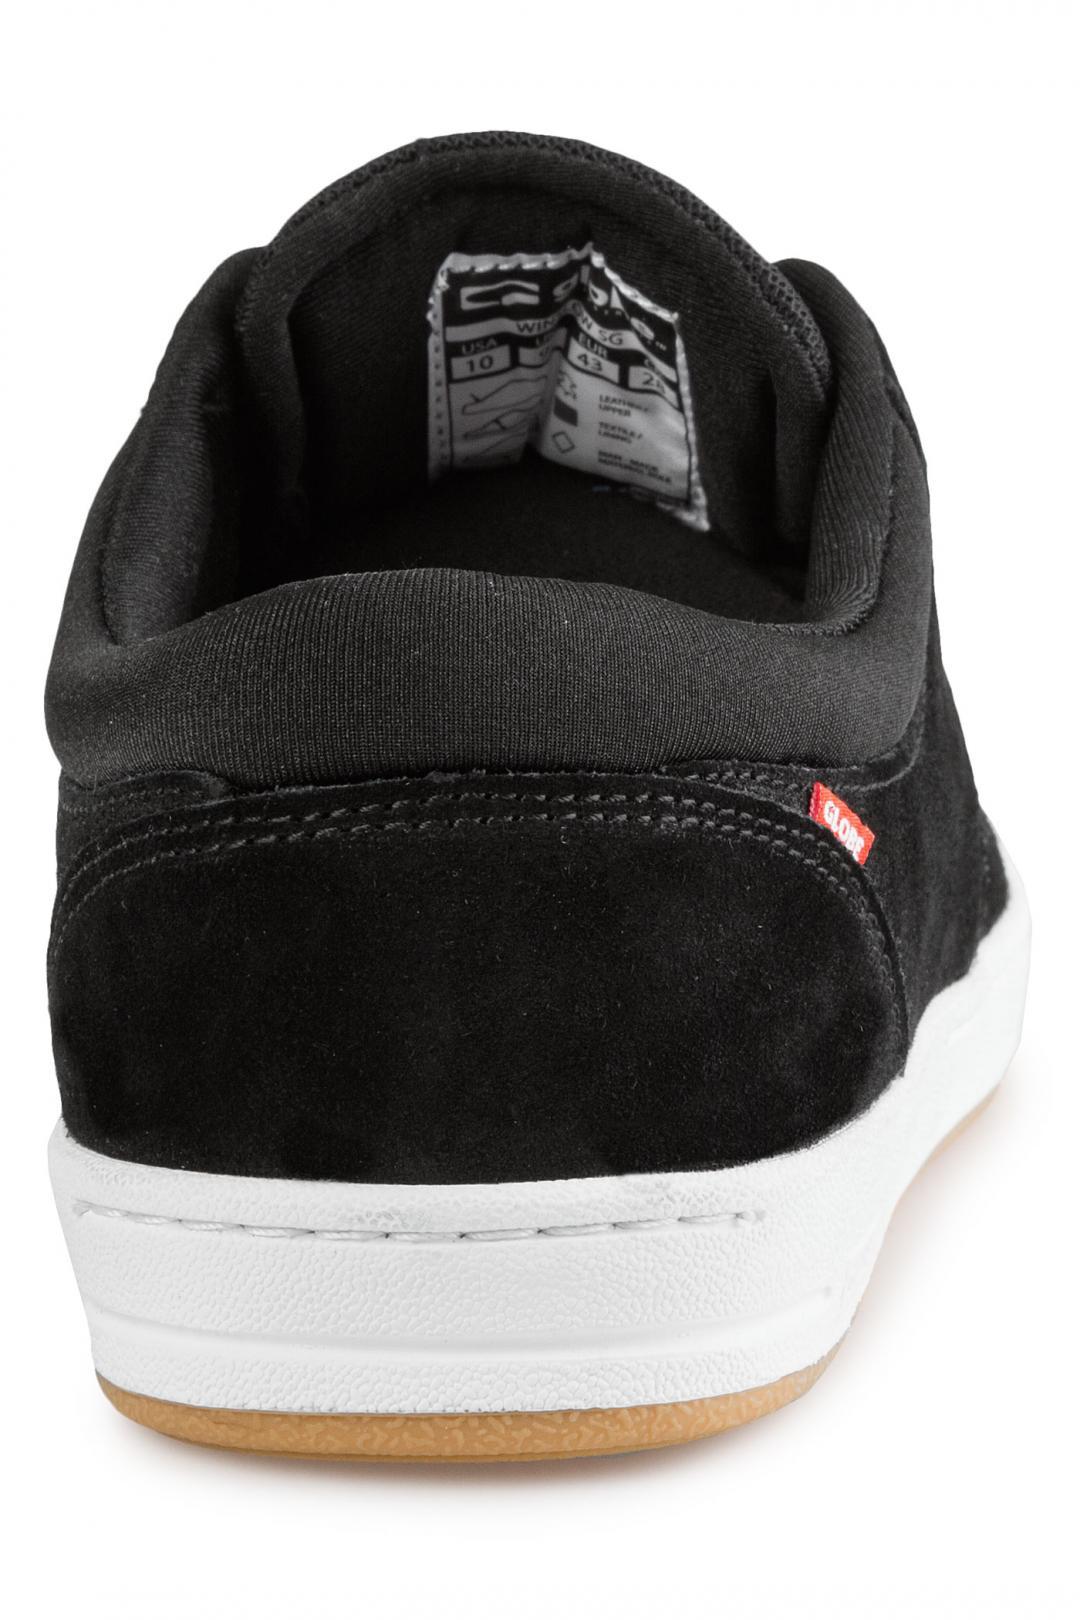 Uomo Globe Winslow SG black white | Sneakers low top